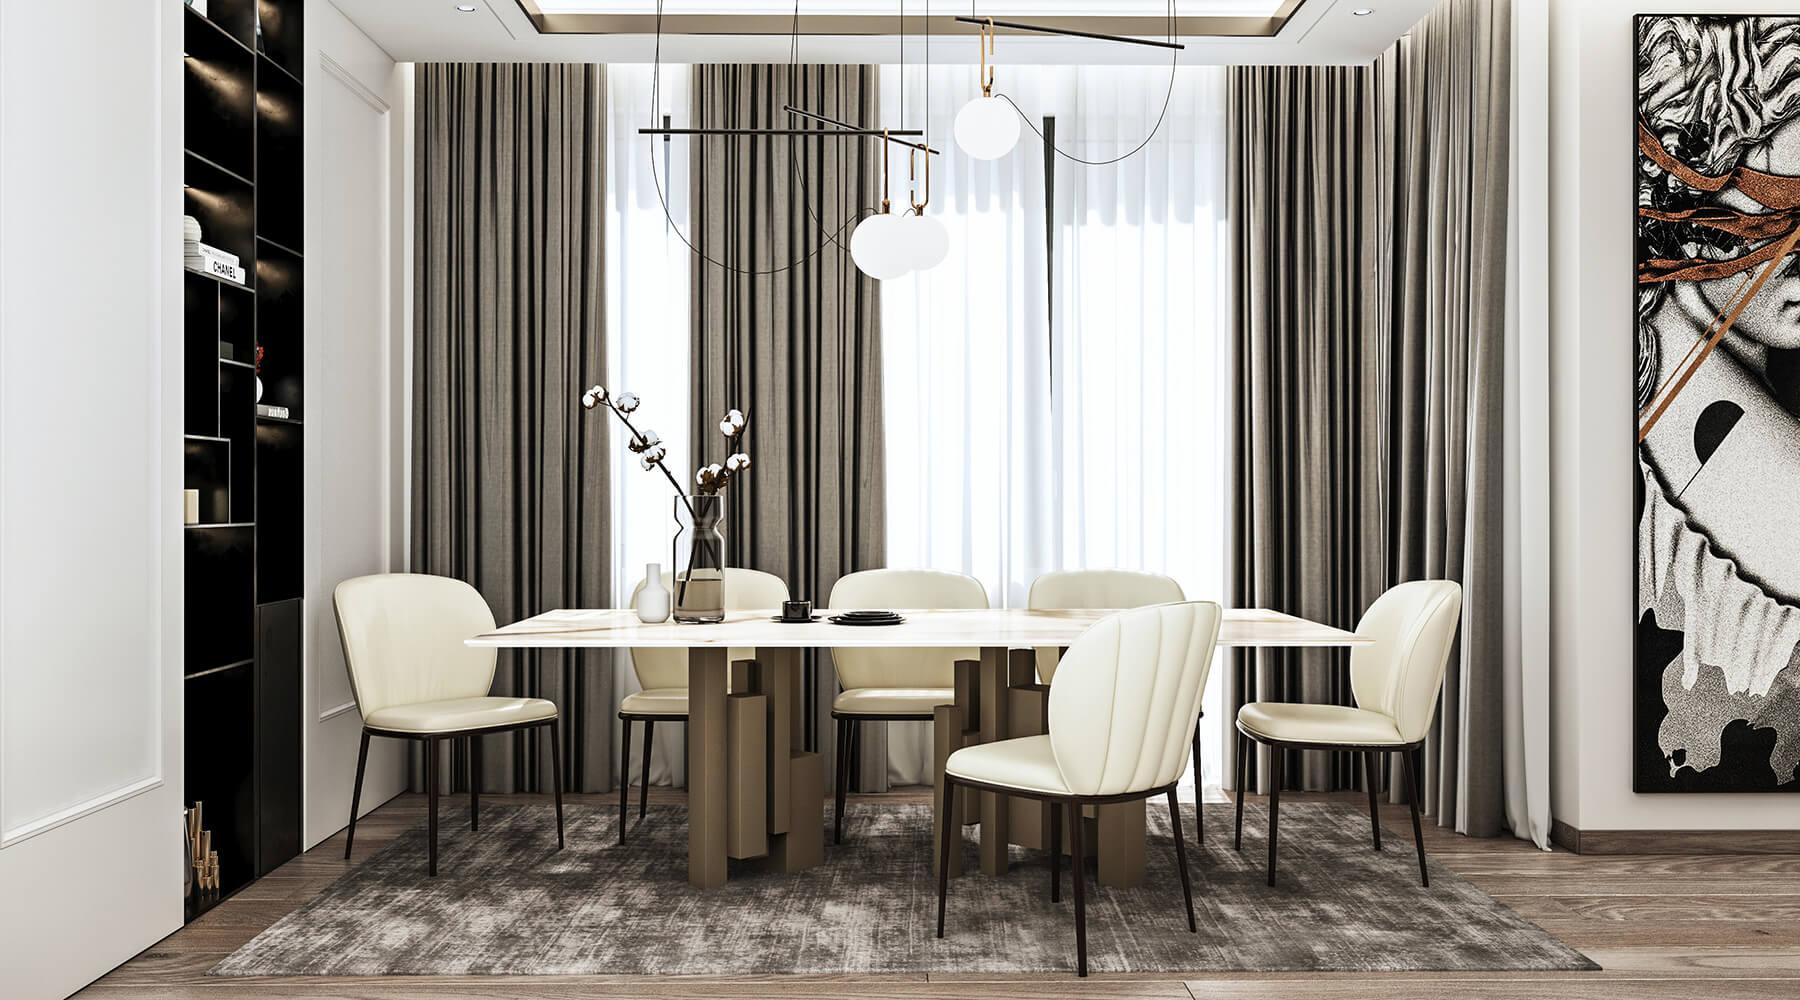 interioren dizain proekt na vsekidnevna s trapezaria proekt orbis